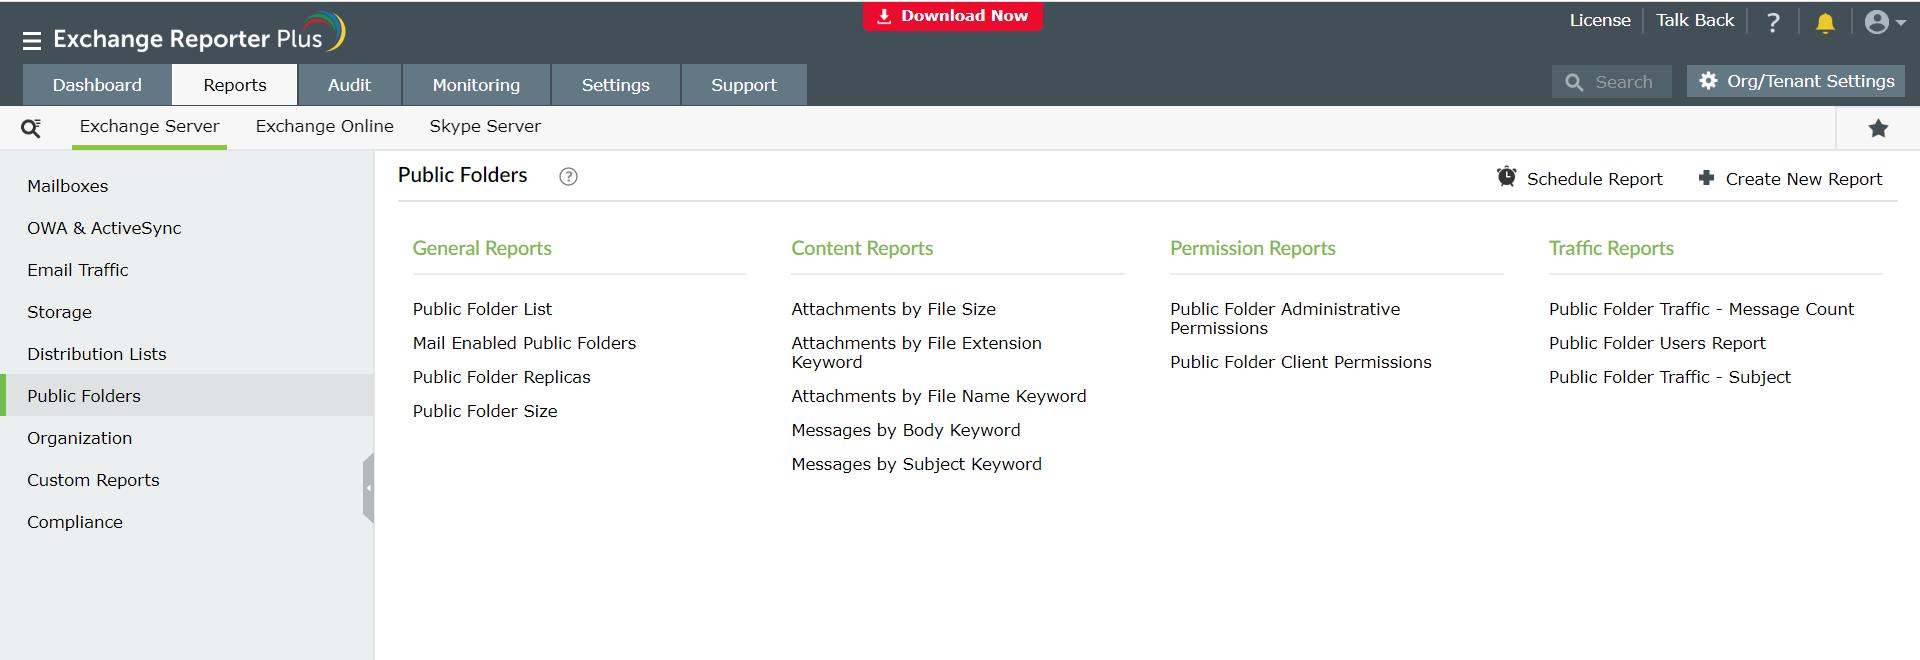 public-folders-reports